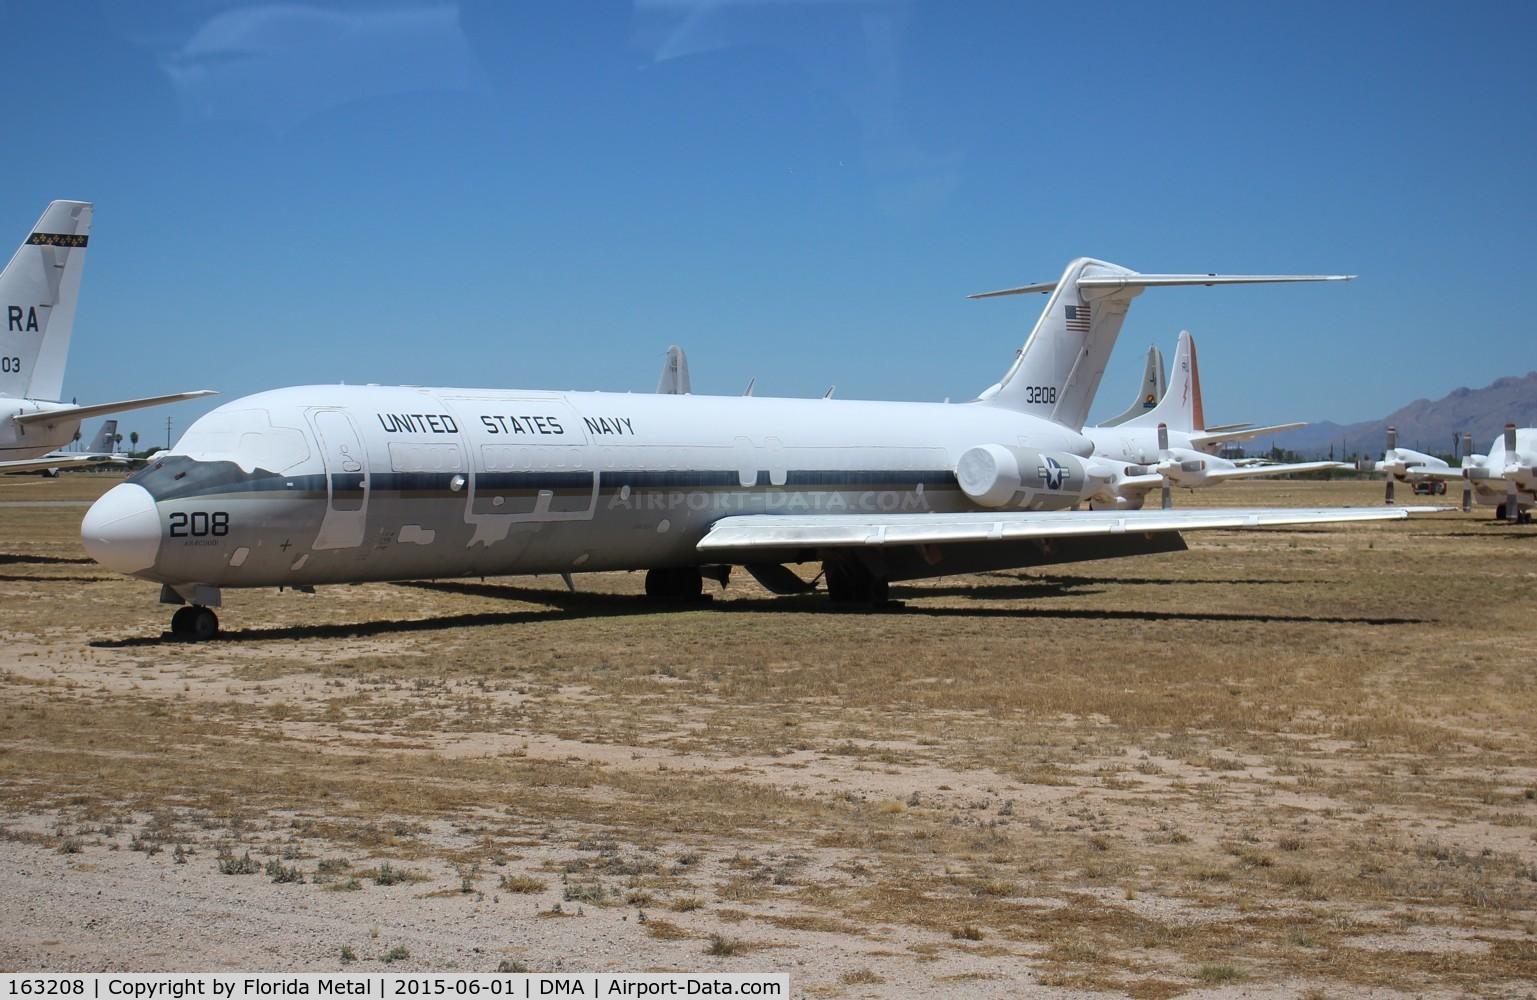 163208, 1974 McDonnell Douglas C-9B Skytrain II C/N 47639, C-9B Skytrain